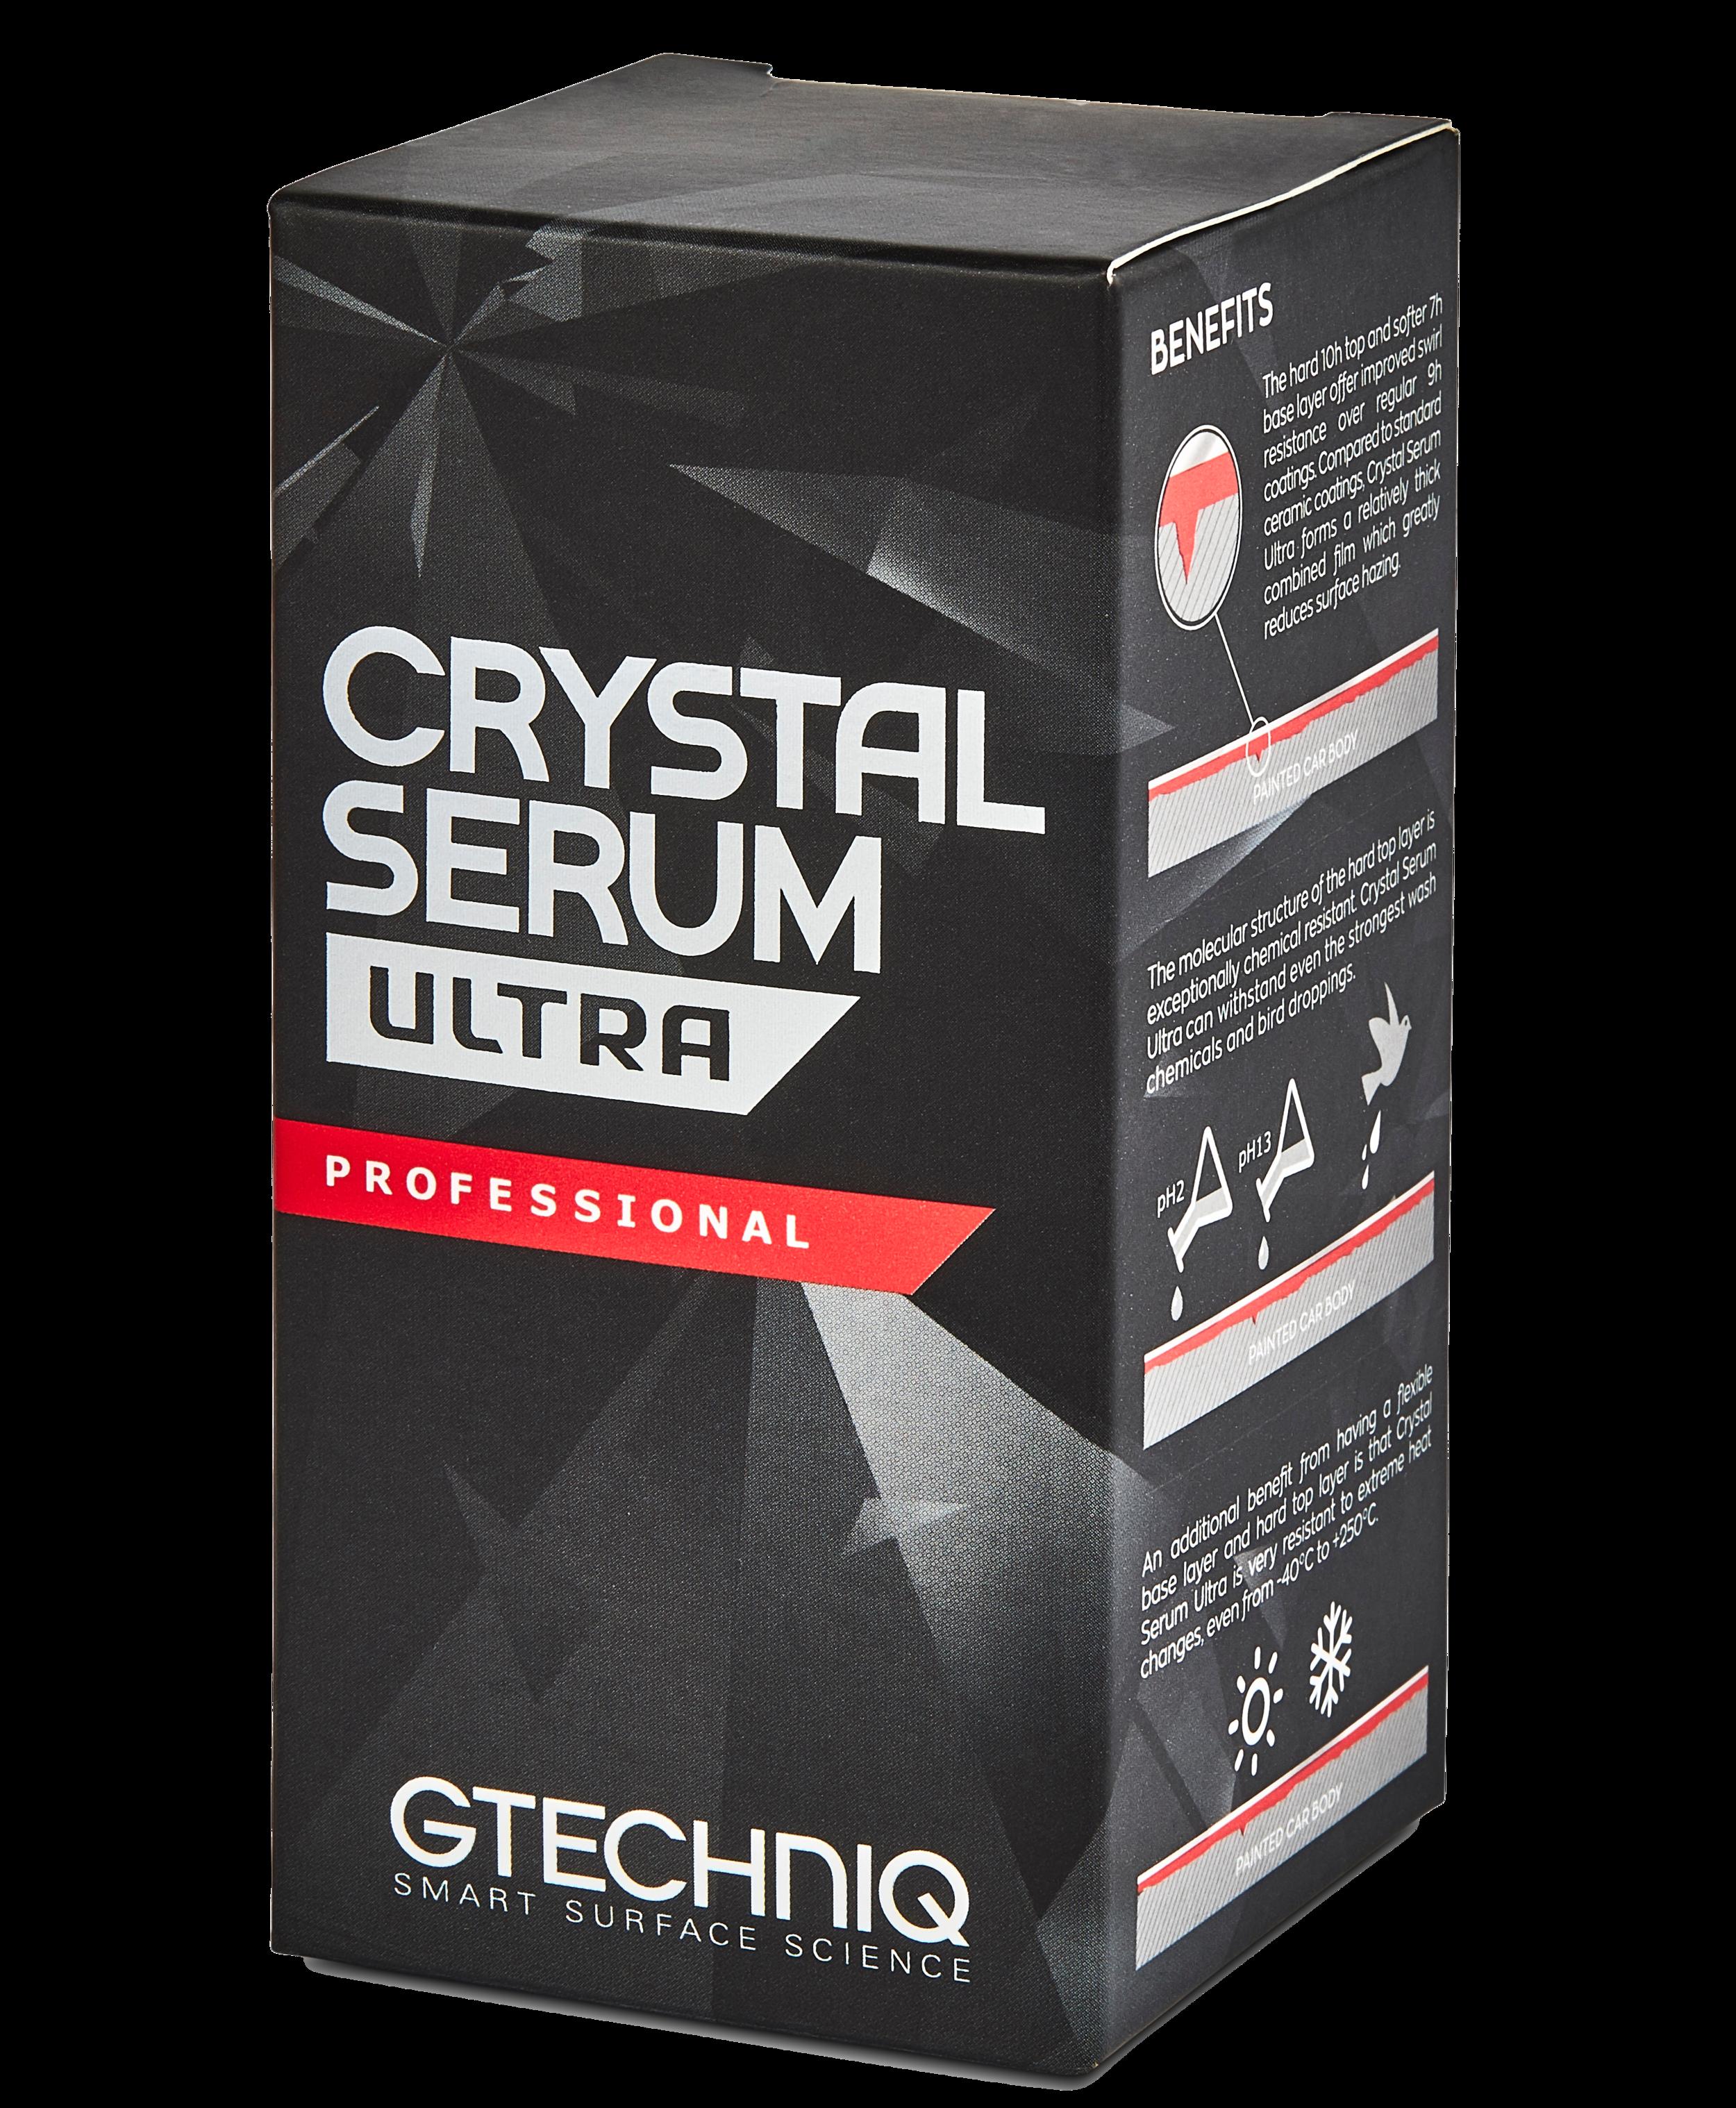 Crystal Serum Ultra Box.jpg